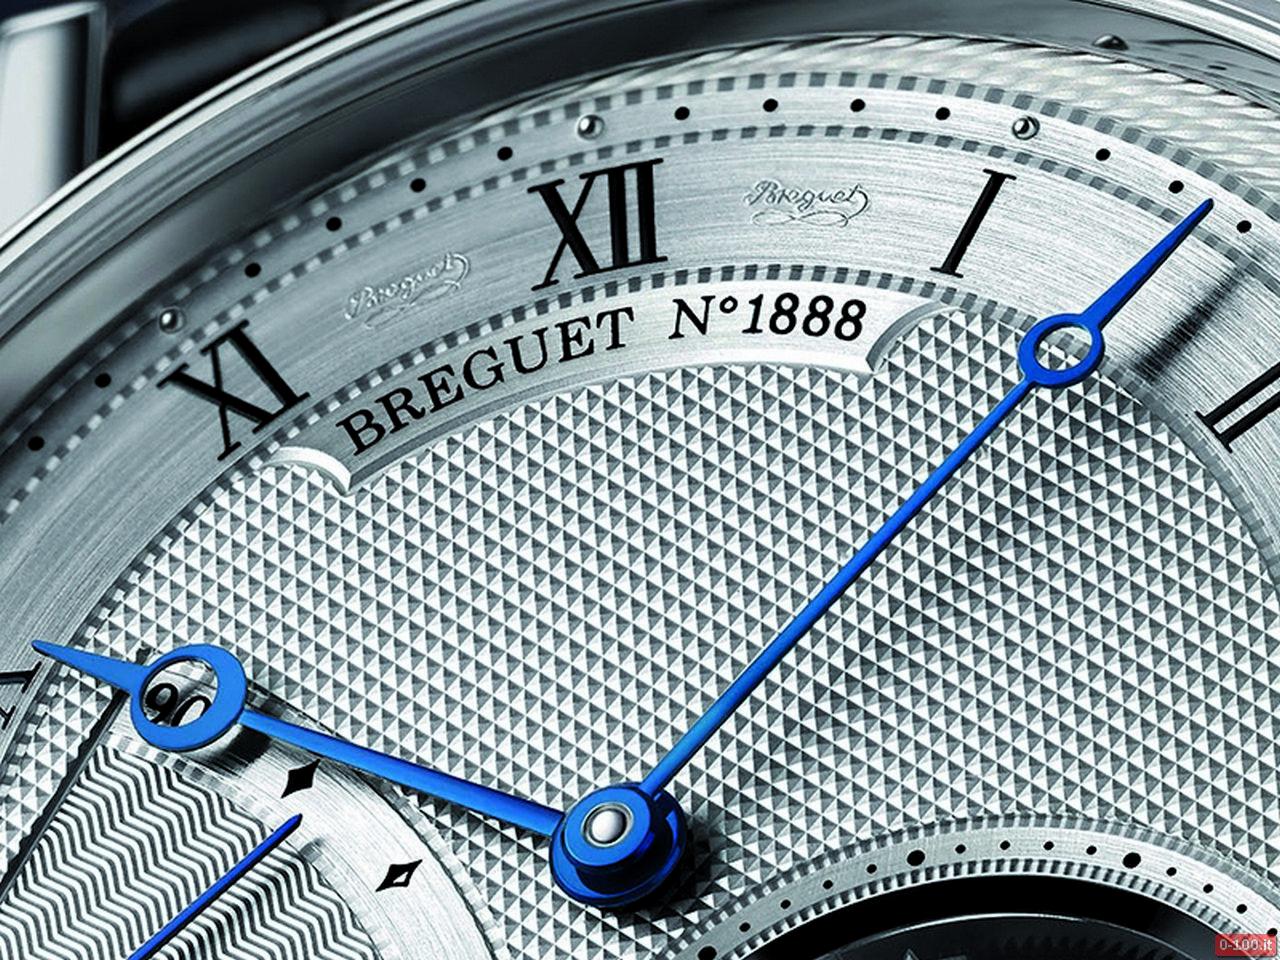 anteprima-baselworld-2014-breguet-classique-grande-complication-tourbillon-extra-plat-automatique-5377-0-100_3